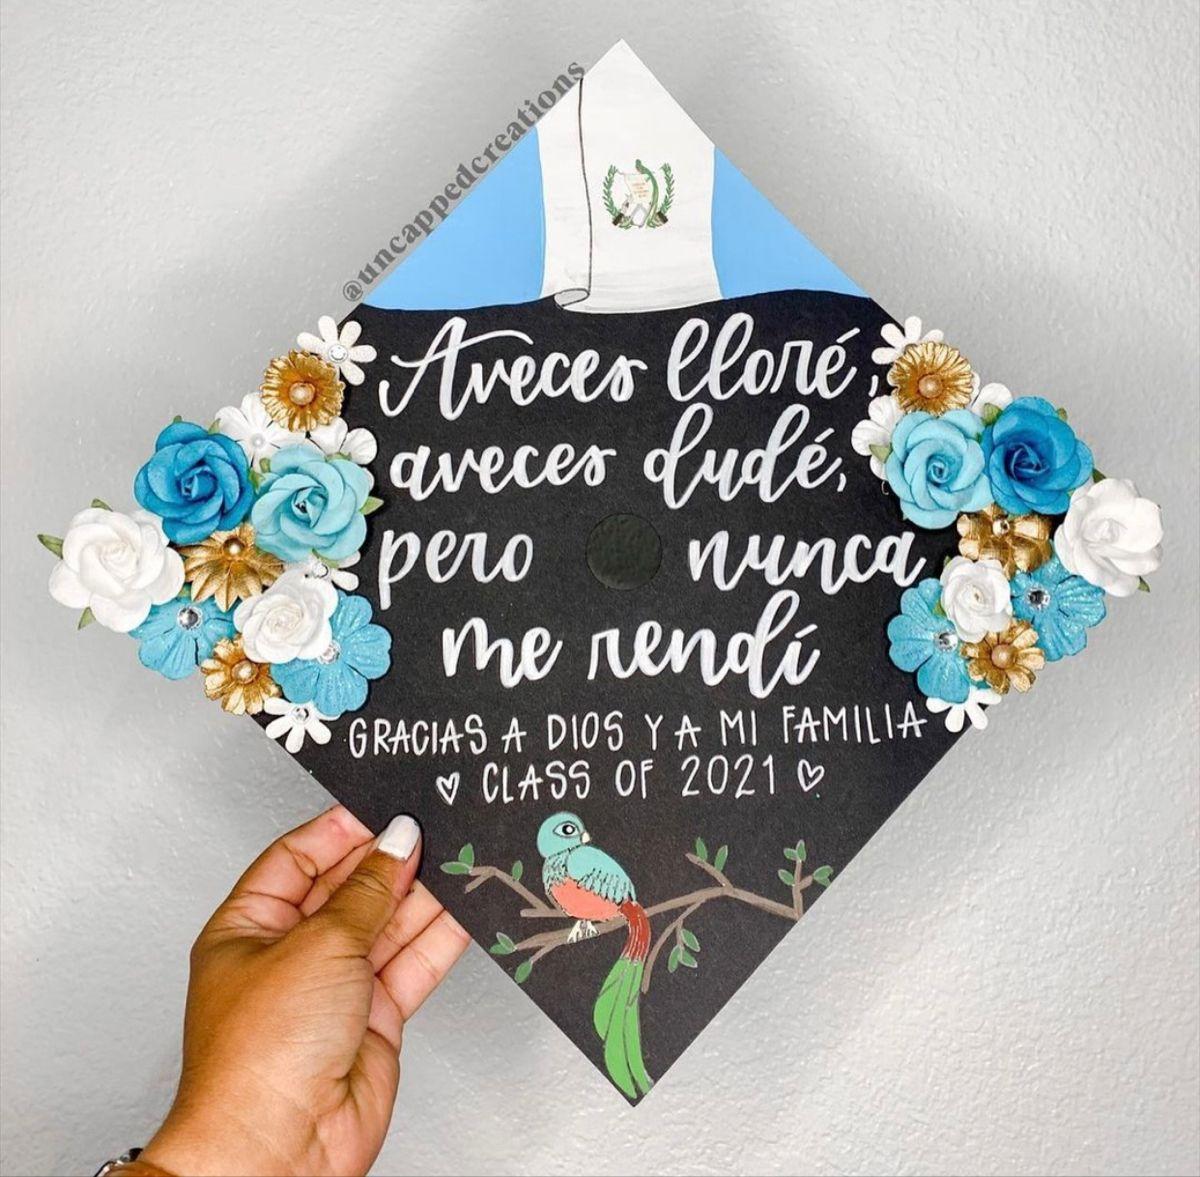 Guatemalan Grad Cap Design In 2021 Grad Cap Designs Graduation Cap Toppers Graduation Cap Designs